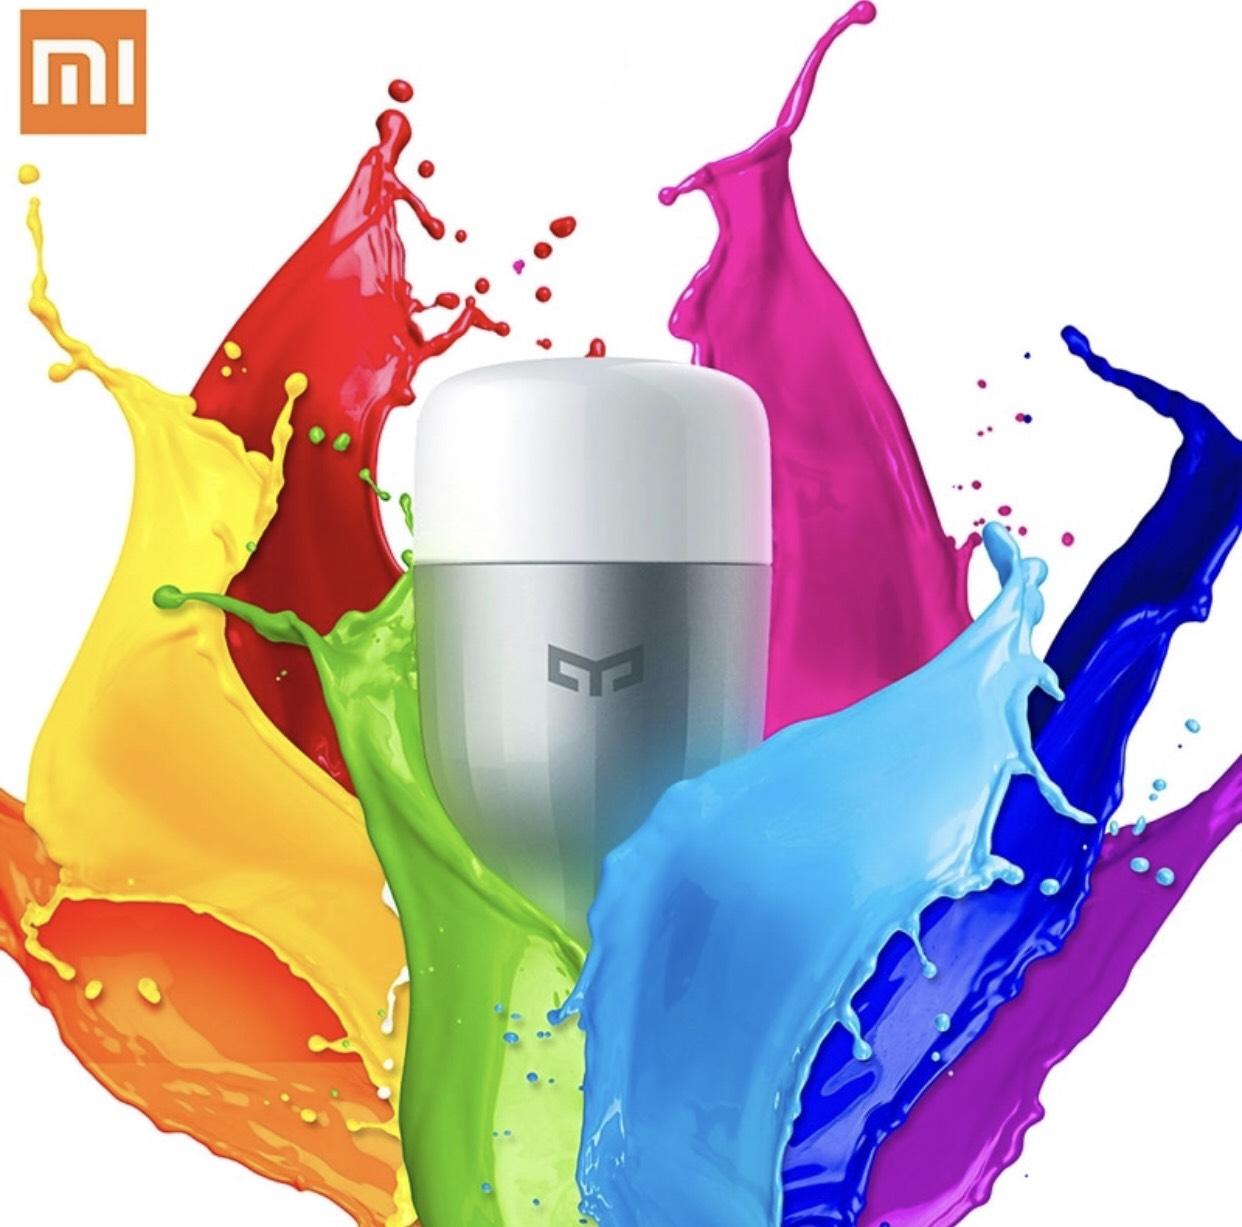 XiaoMi Yeelight Kleurrijke Lamp E27 1th